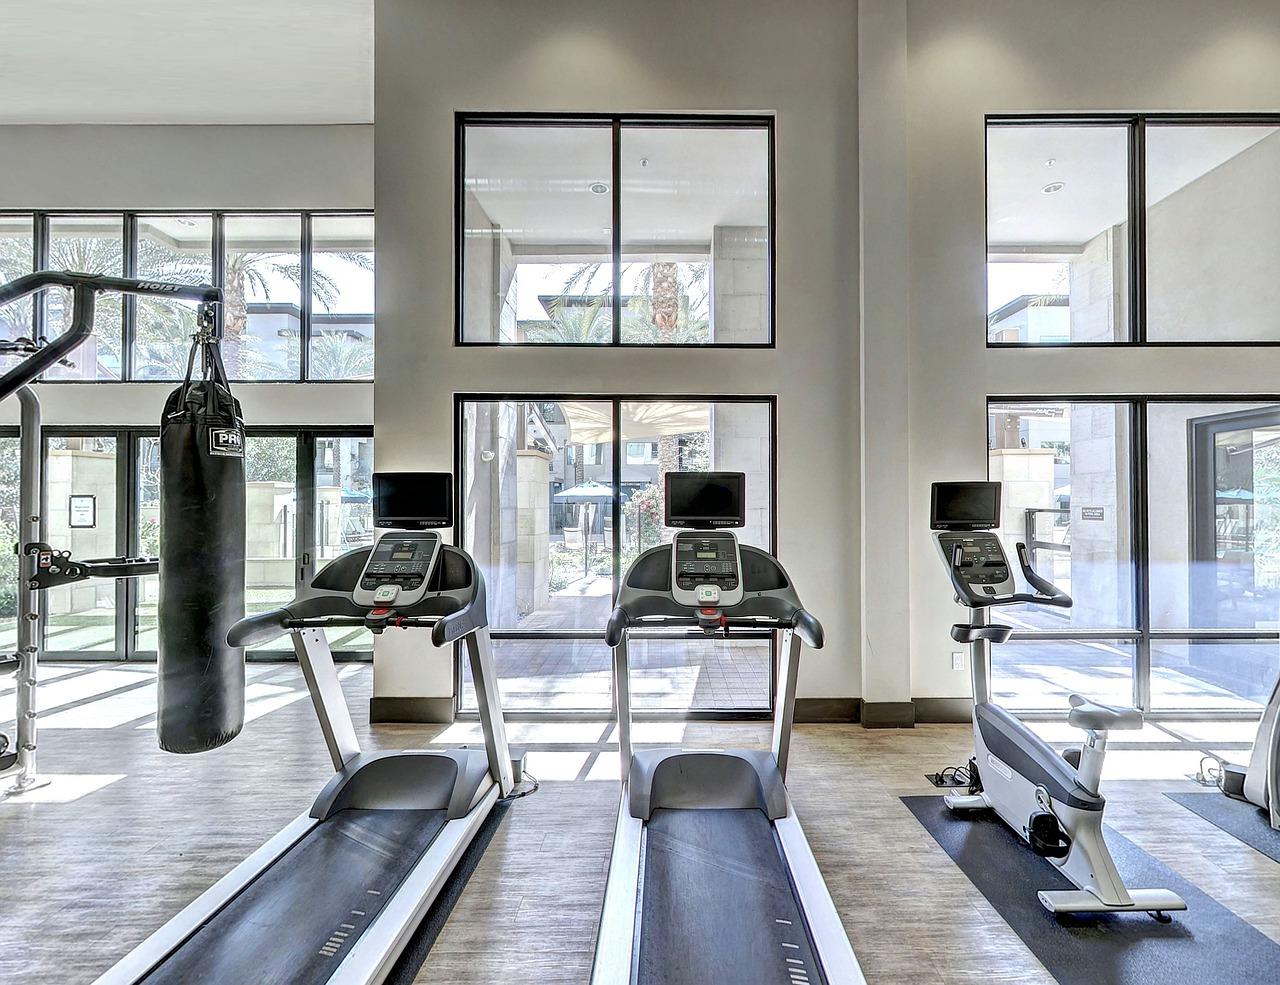 workout-5030857_1280